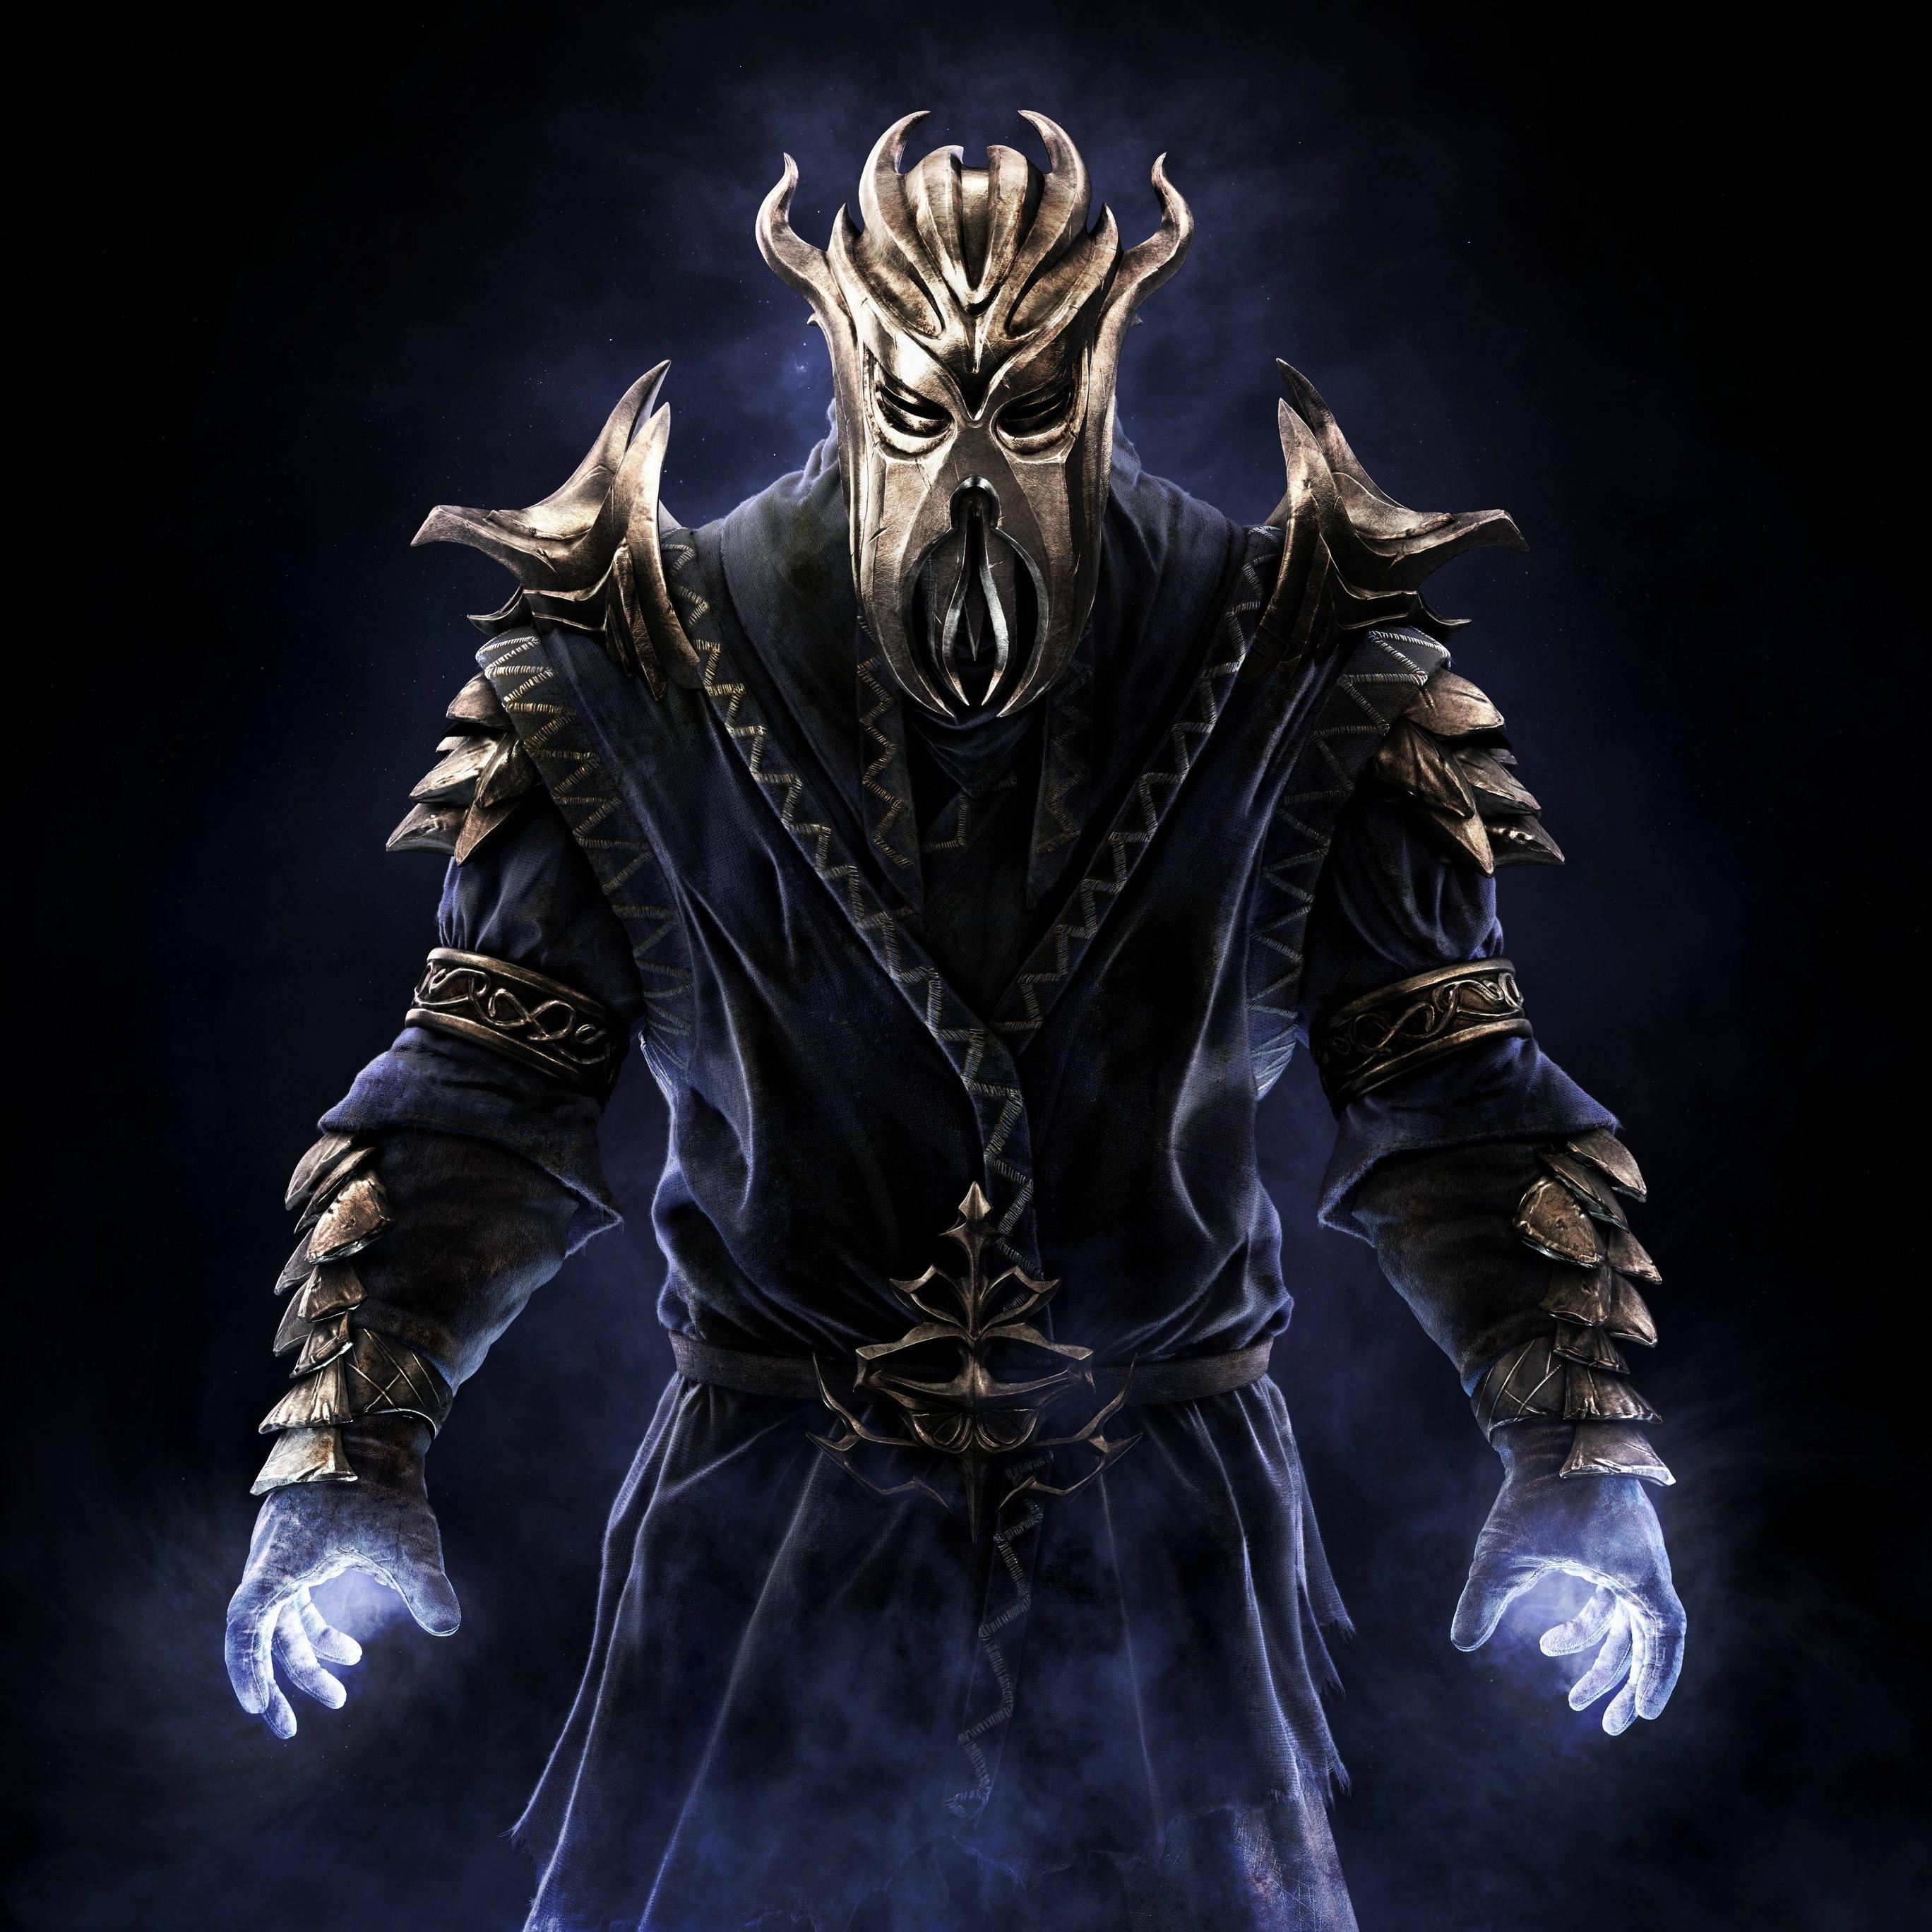 http://img4.wikia.nocookie.net/__cb20121121132845/elderscrolls/images/e/e9/First_Dragonborn.jpg